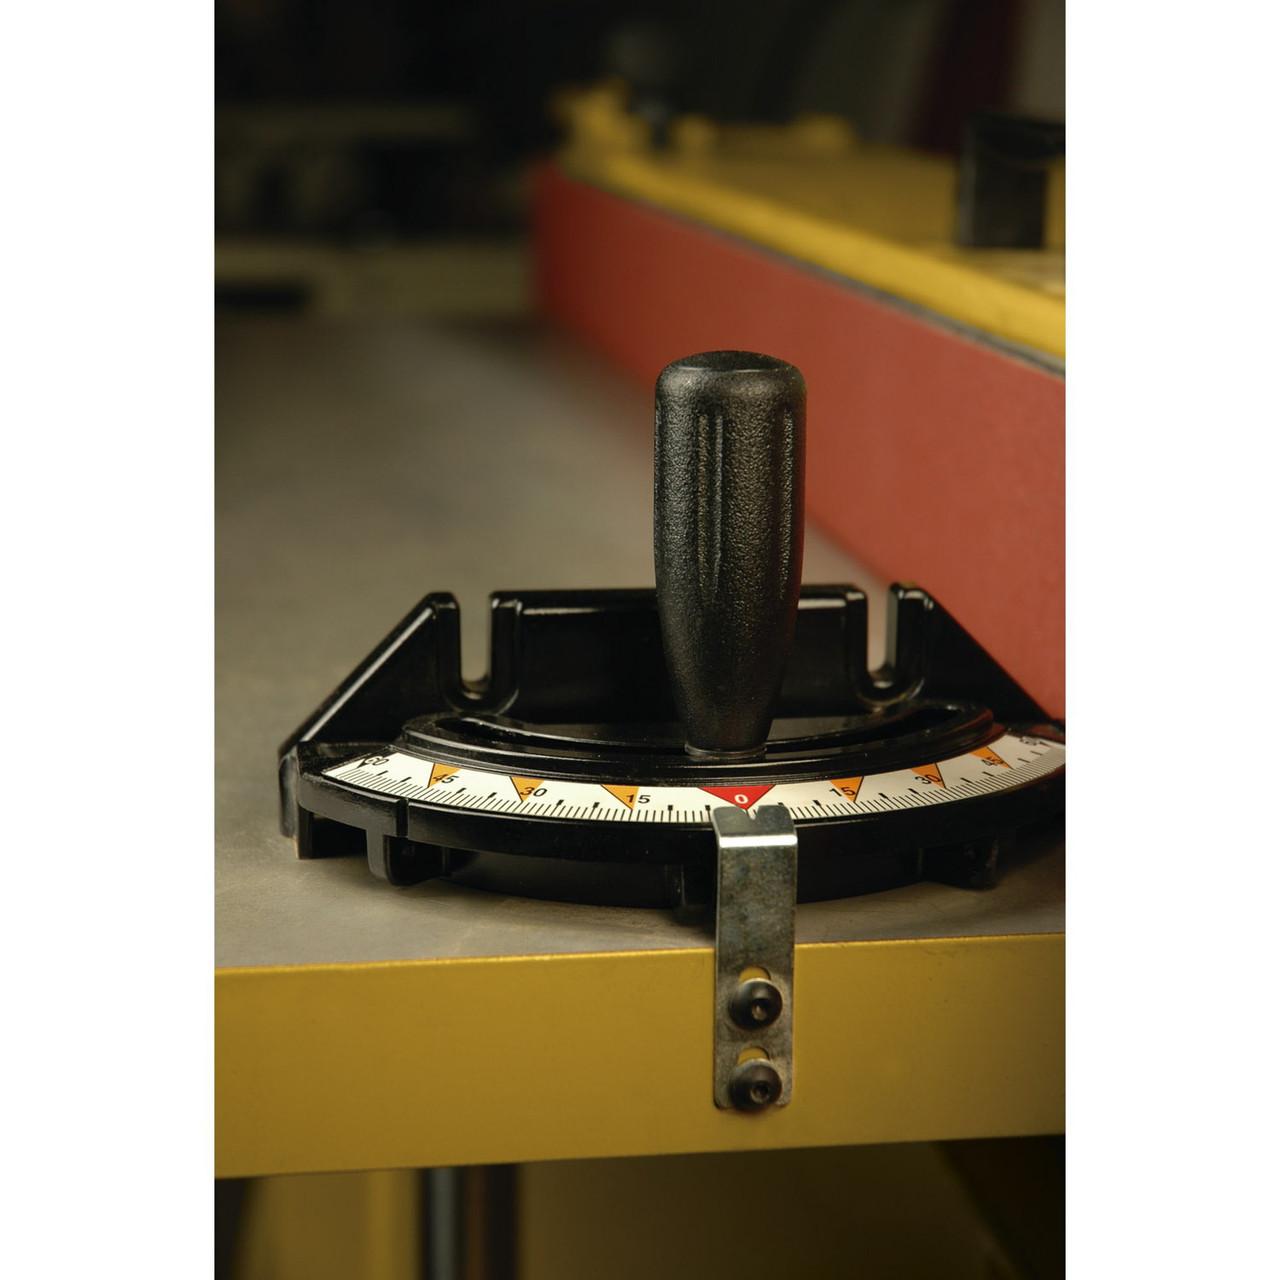 Powermatic OES9138 Oscillating Edge Sander, 3HP 3PH 230/460V